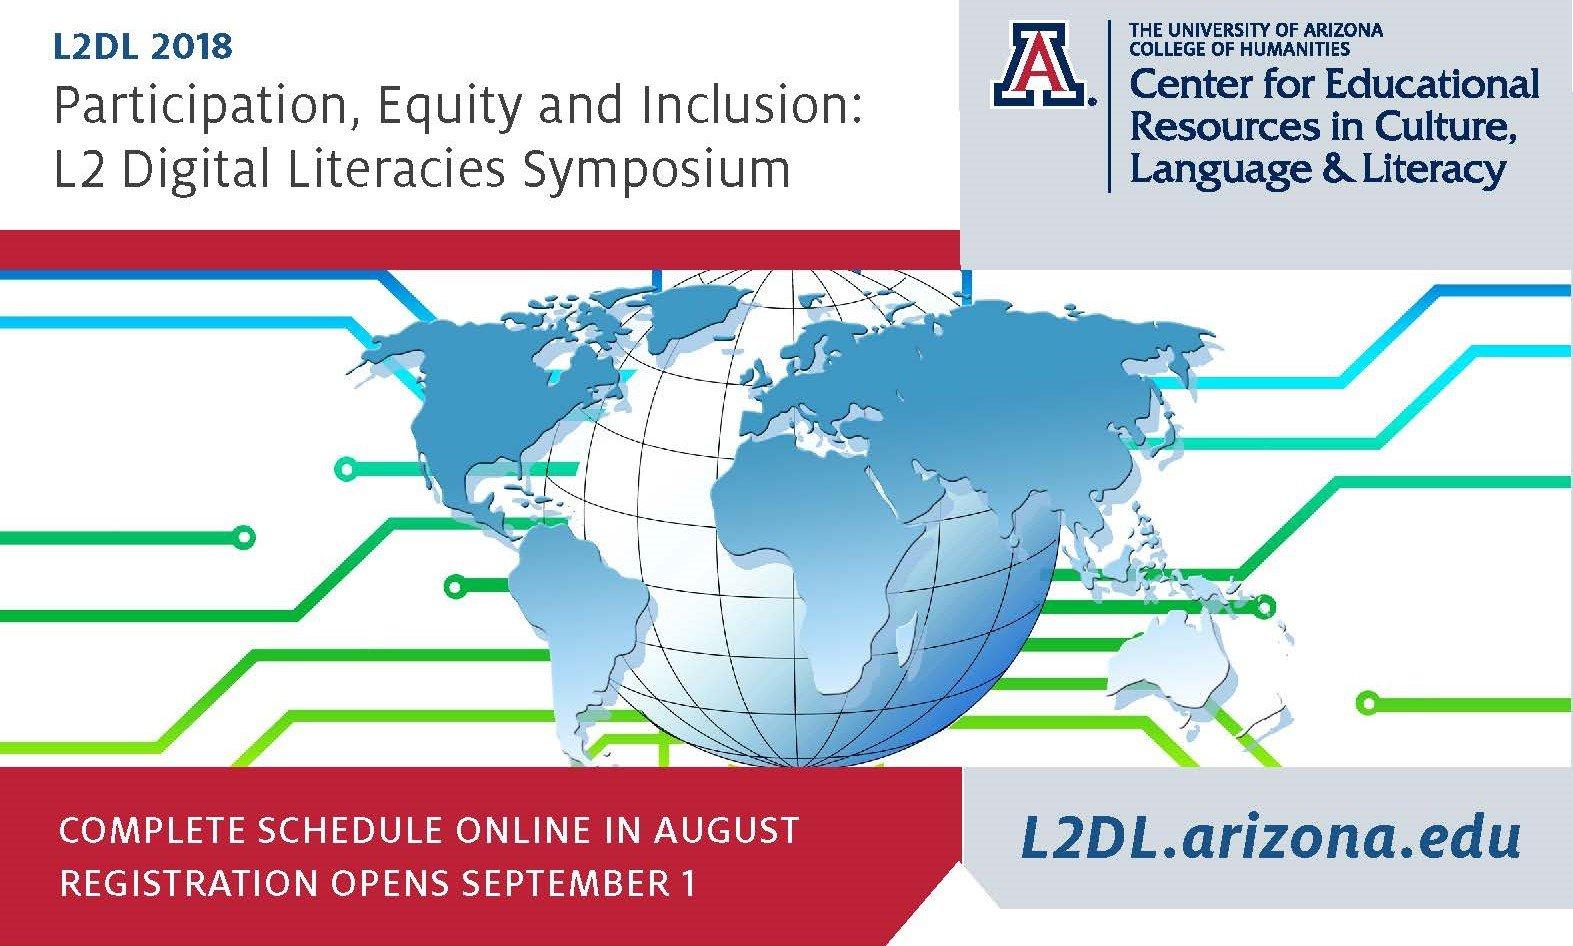 Participation, Equity and Inclusion: L2DL Digital Literacies (L2DL) Symposium